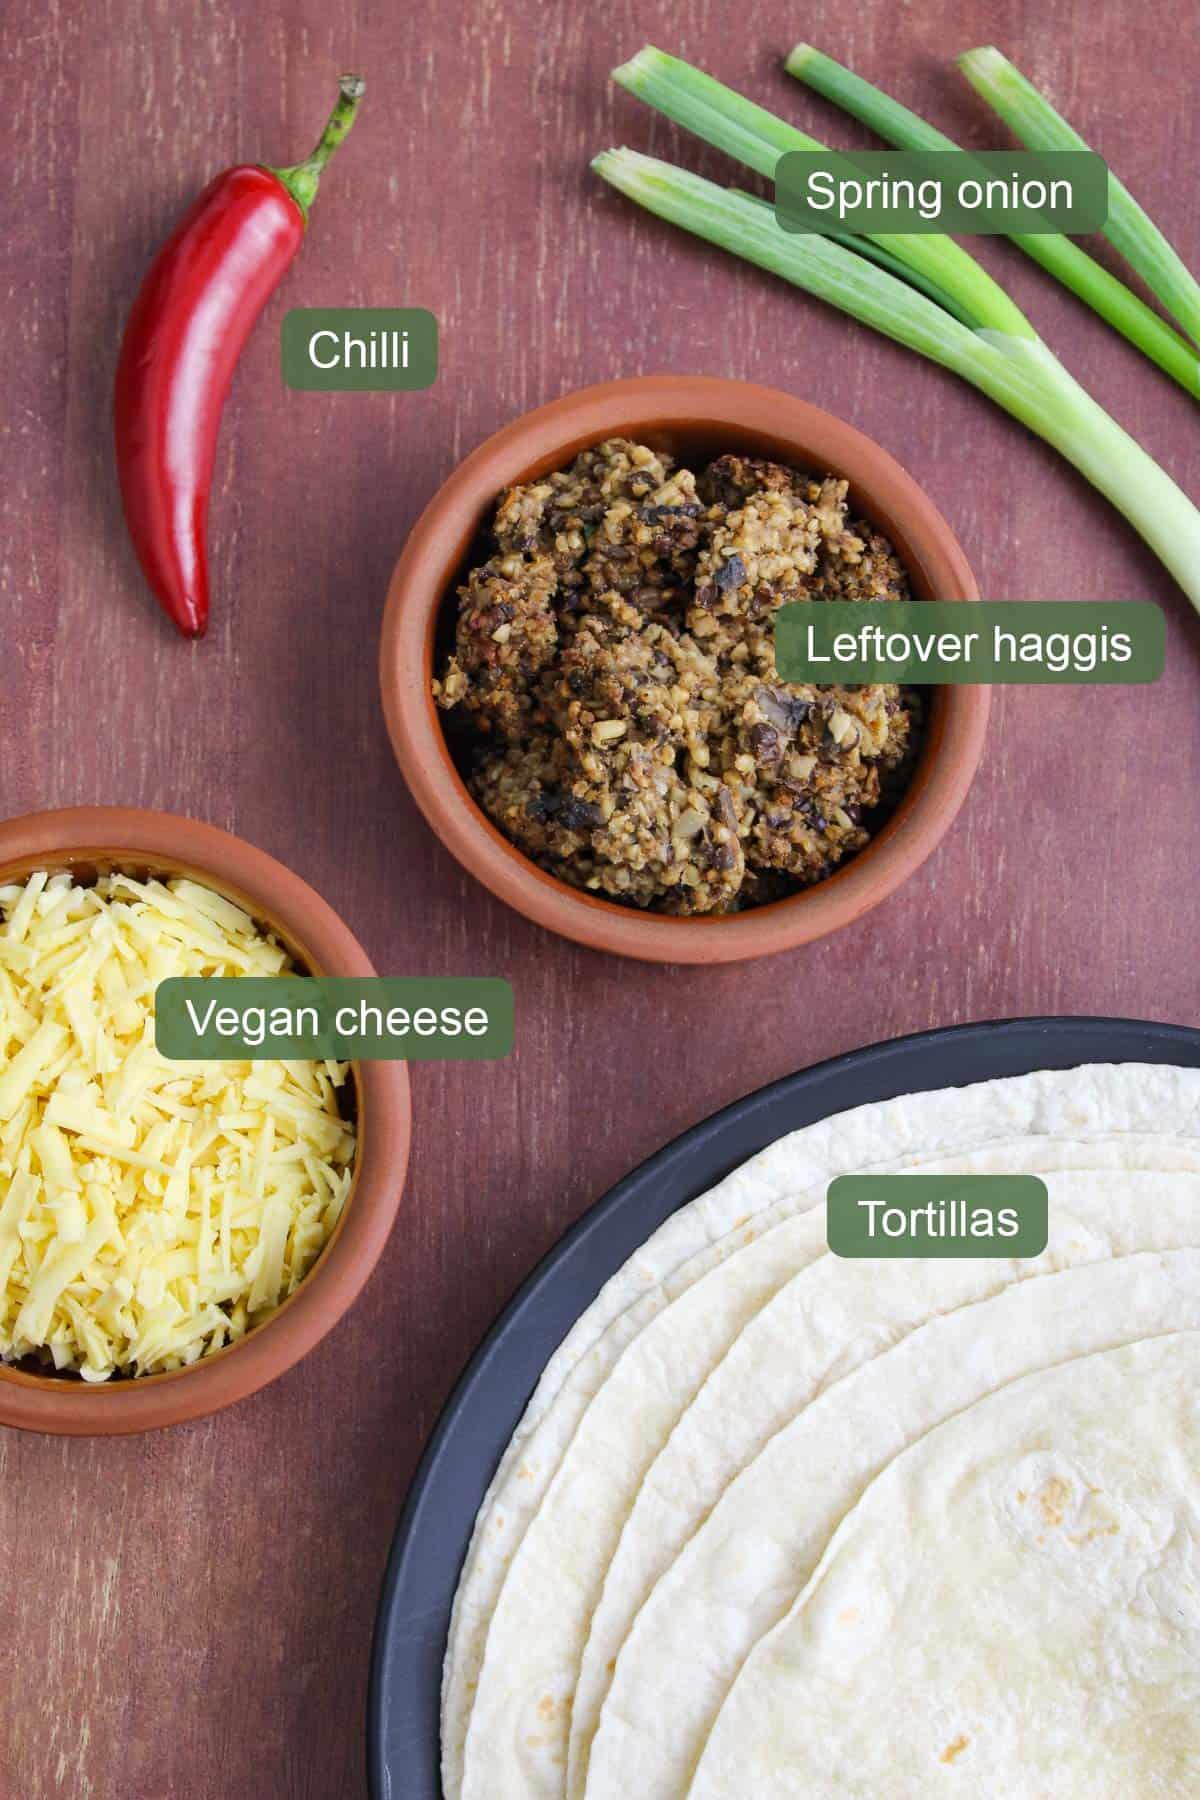 List of Ingredients to Make Haggis Quesadilla